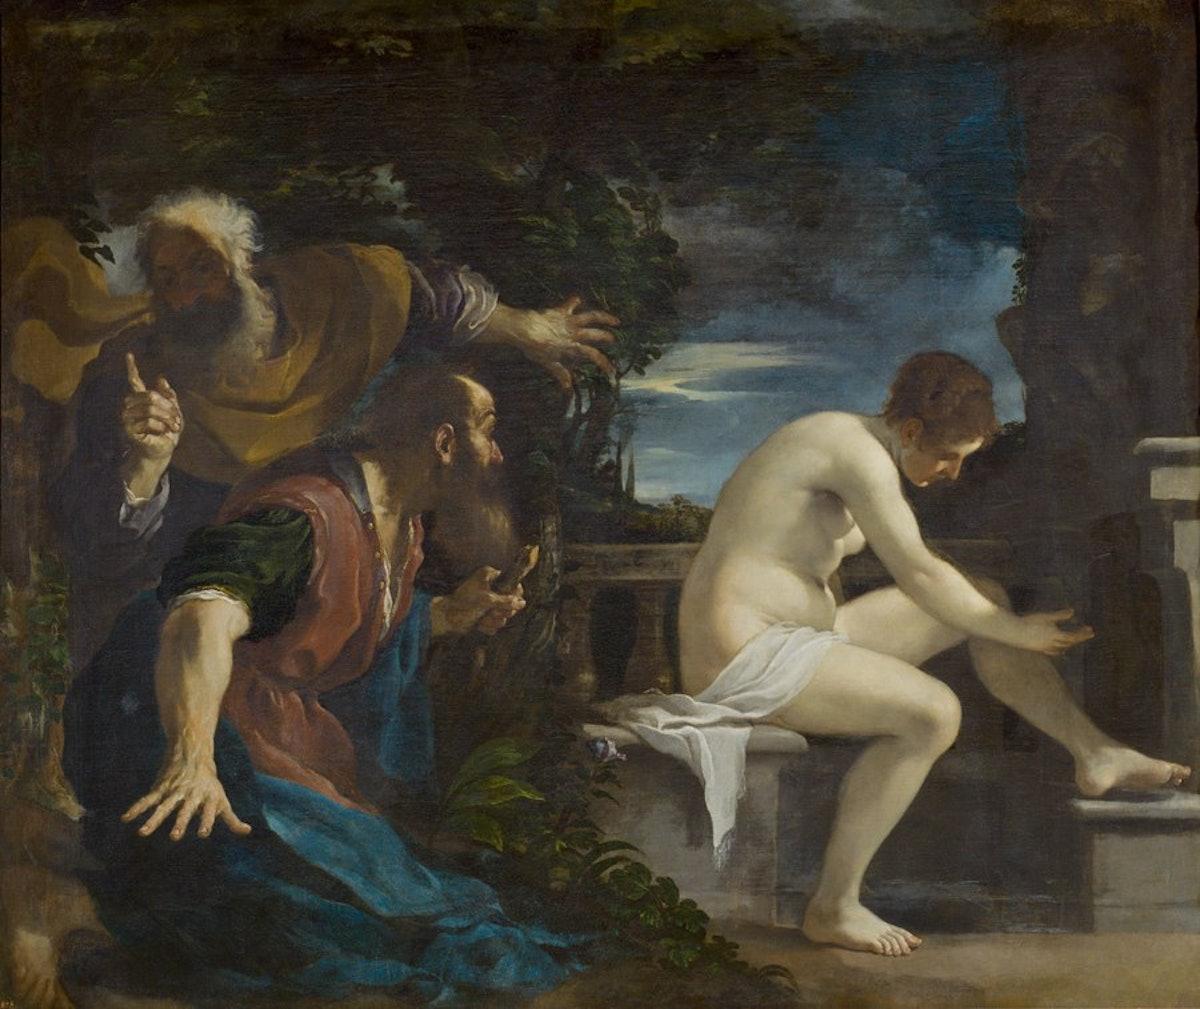 Guercino%2c-Susannah-and-the-Elders-Online.jpg